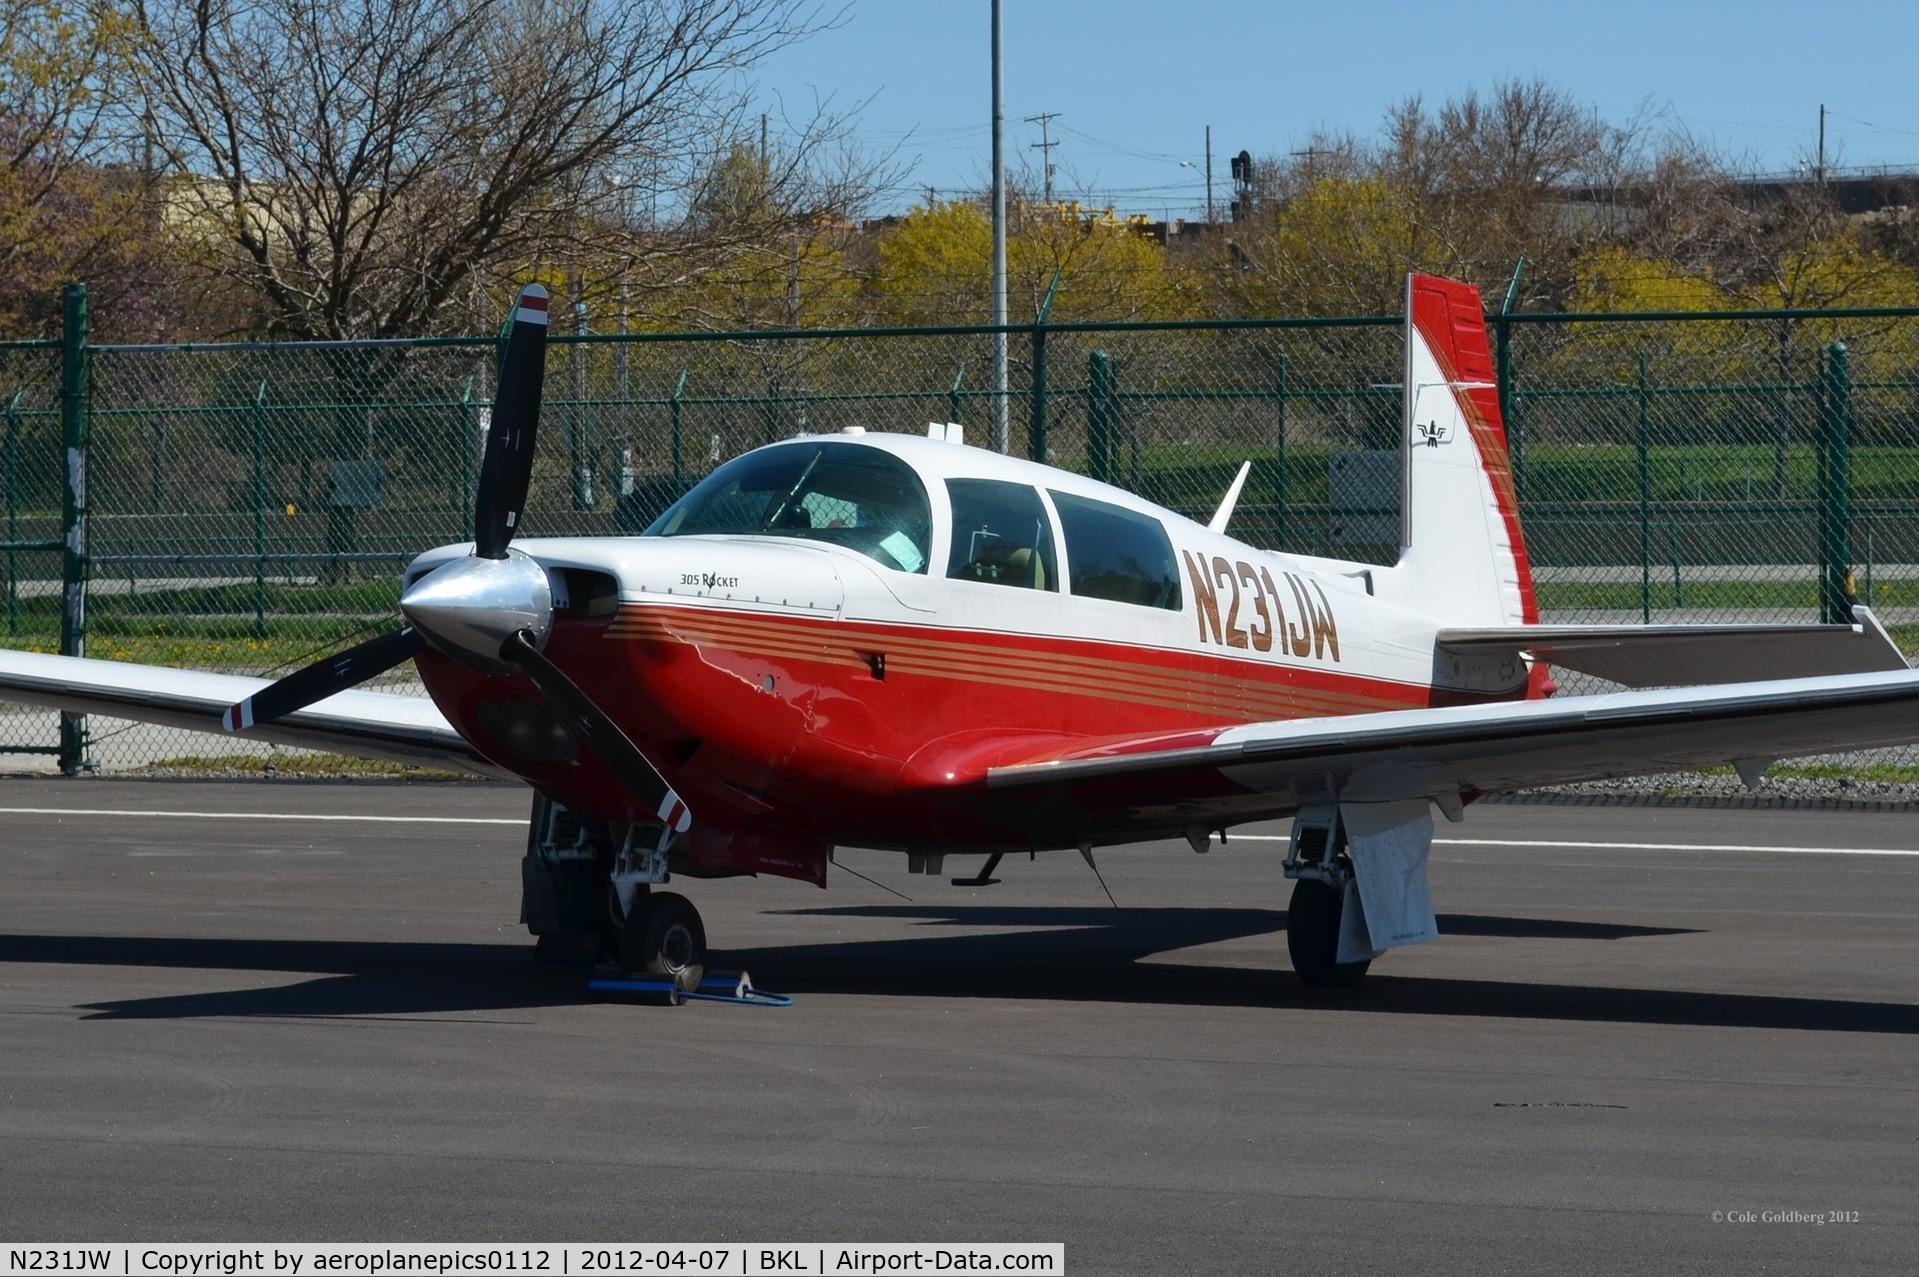 N231JW, 1979 Mooney M20K C/N 25-0031, N231JW seen at KBKL in red paint.